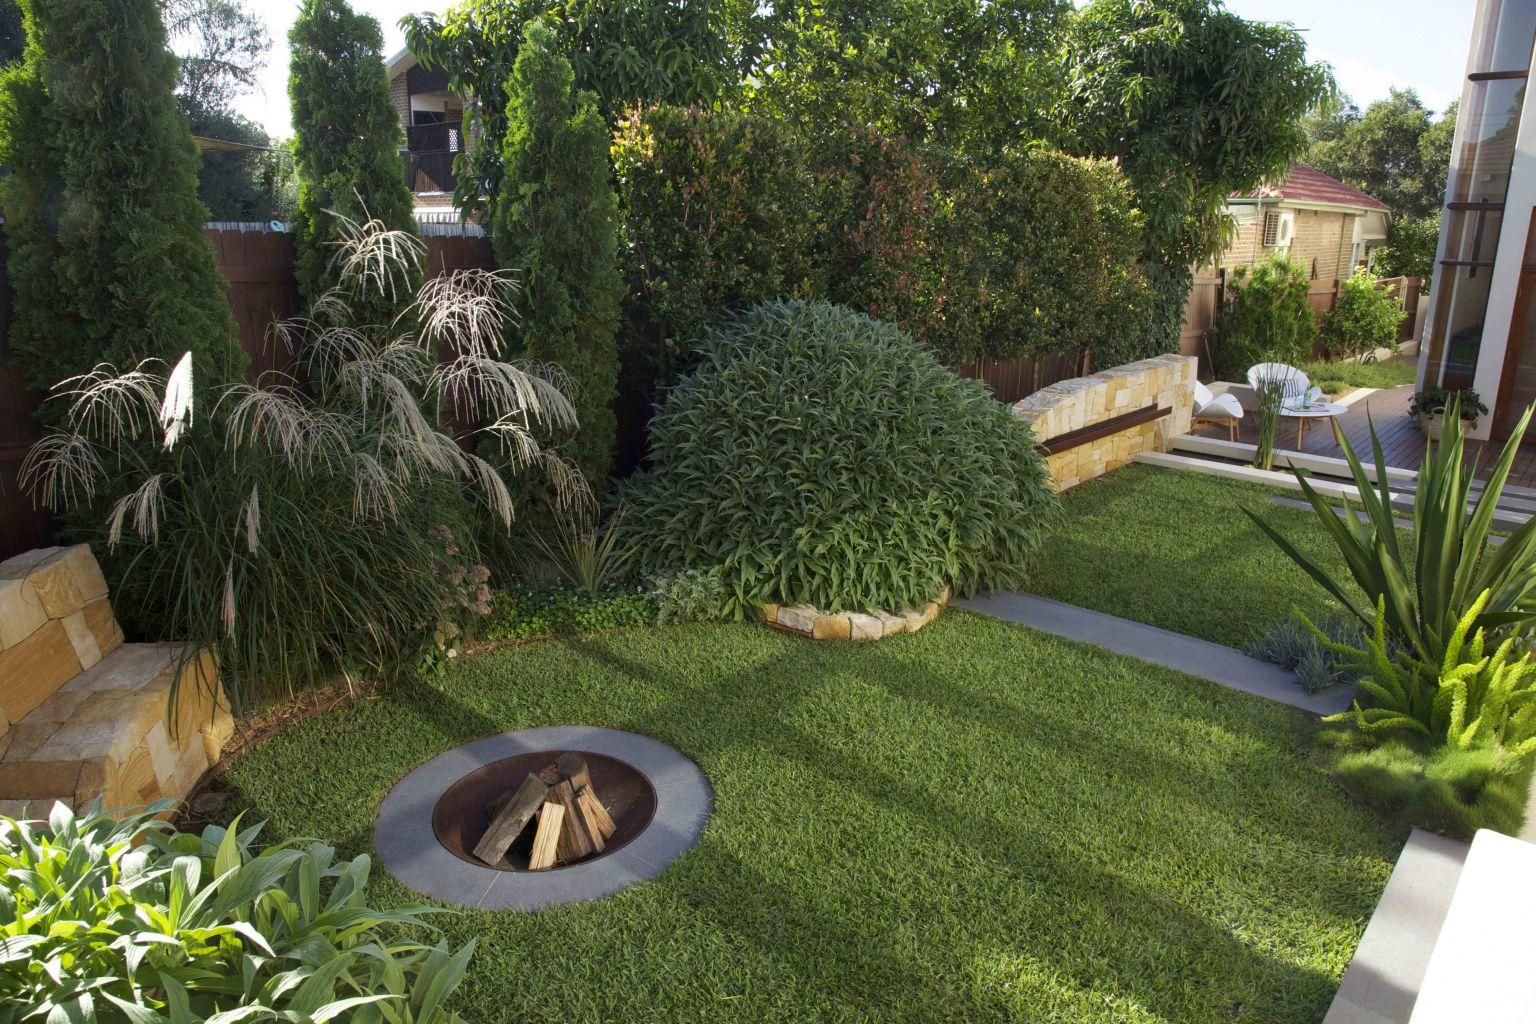 Backyard Garden Center Arcadia Wi Garden Design within measurements 1536 X 1024